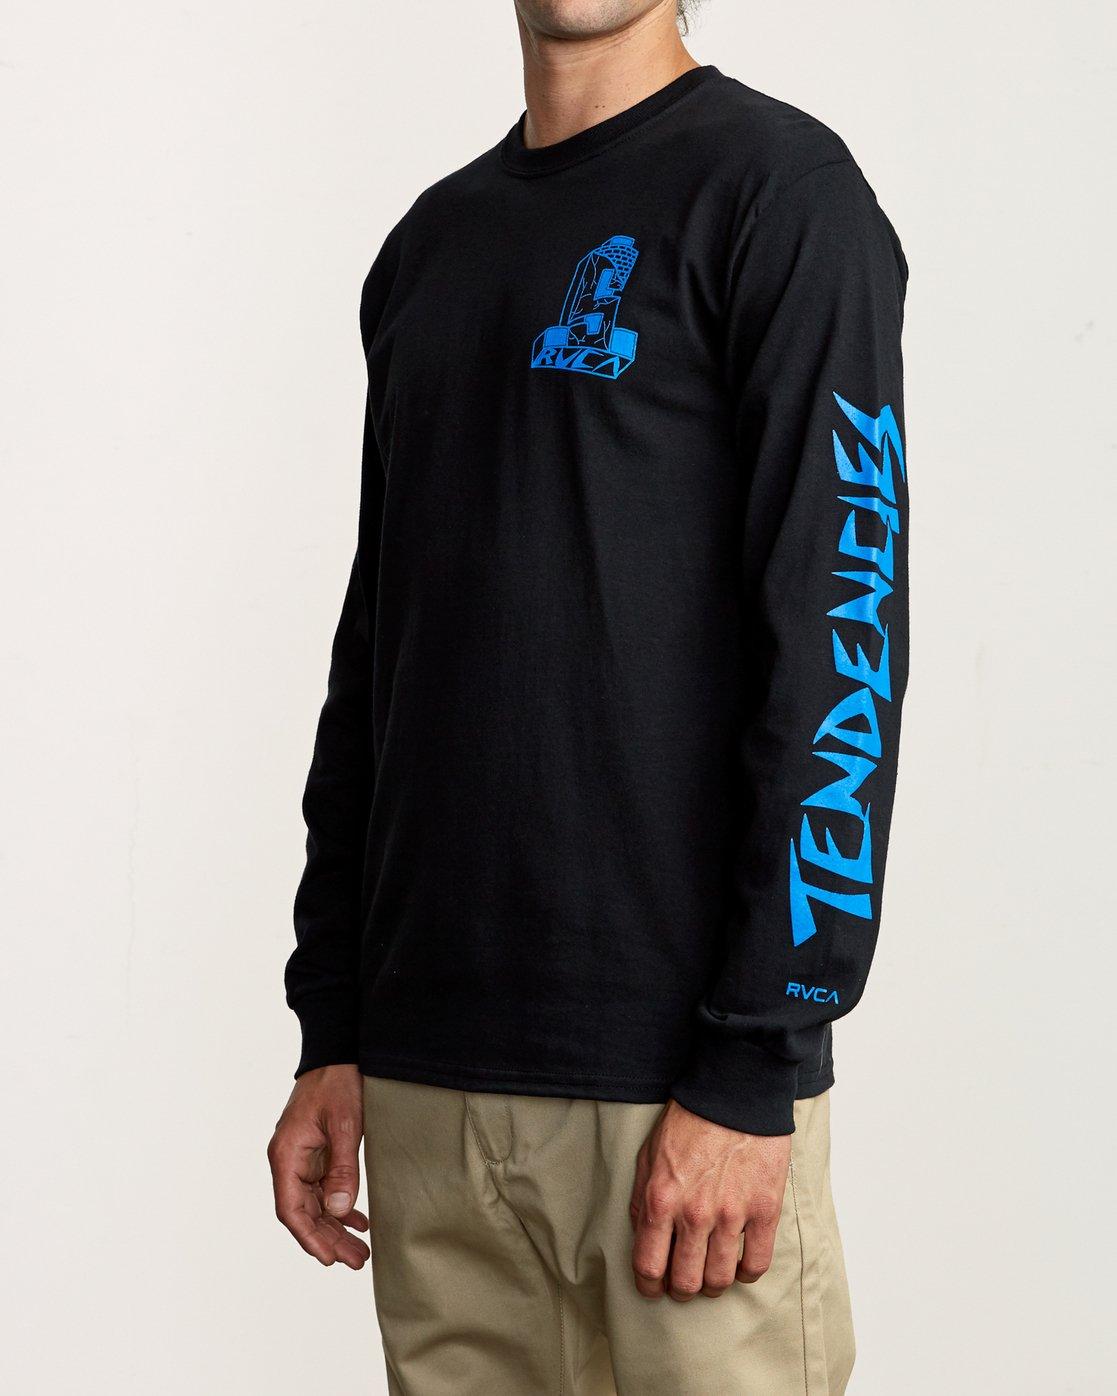 4 RVCA x Suicidal Tendencies Long Sleeve T-Shirt Black M459TRSU RVCA